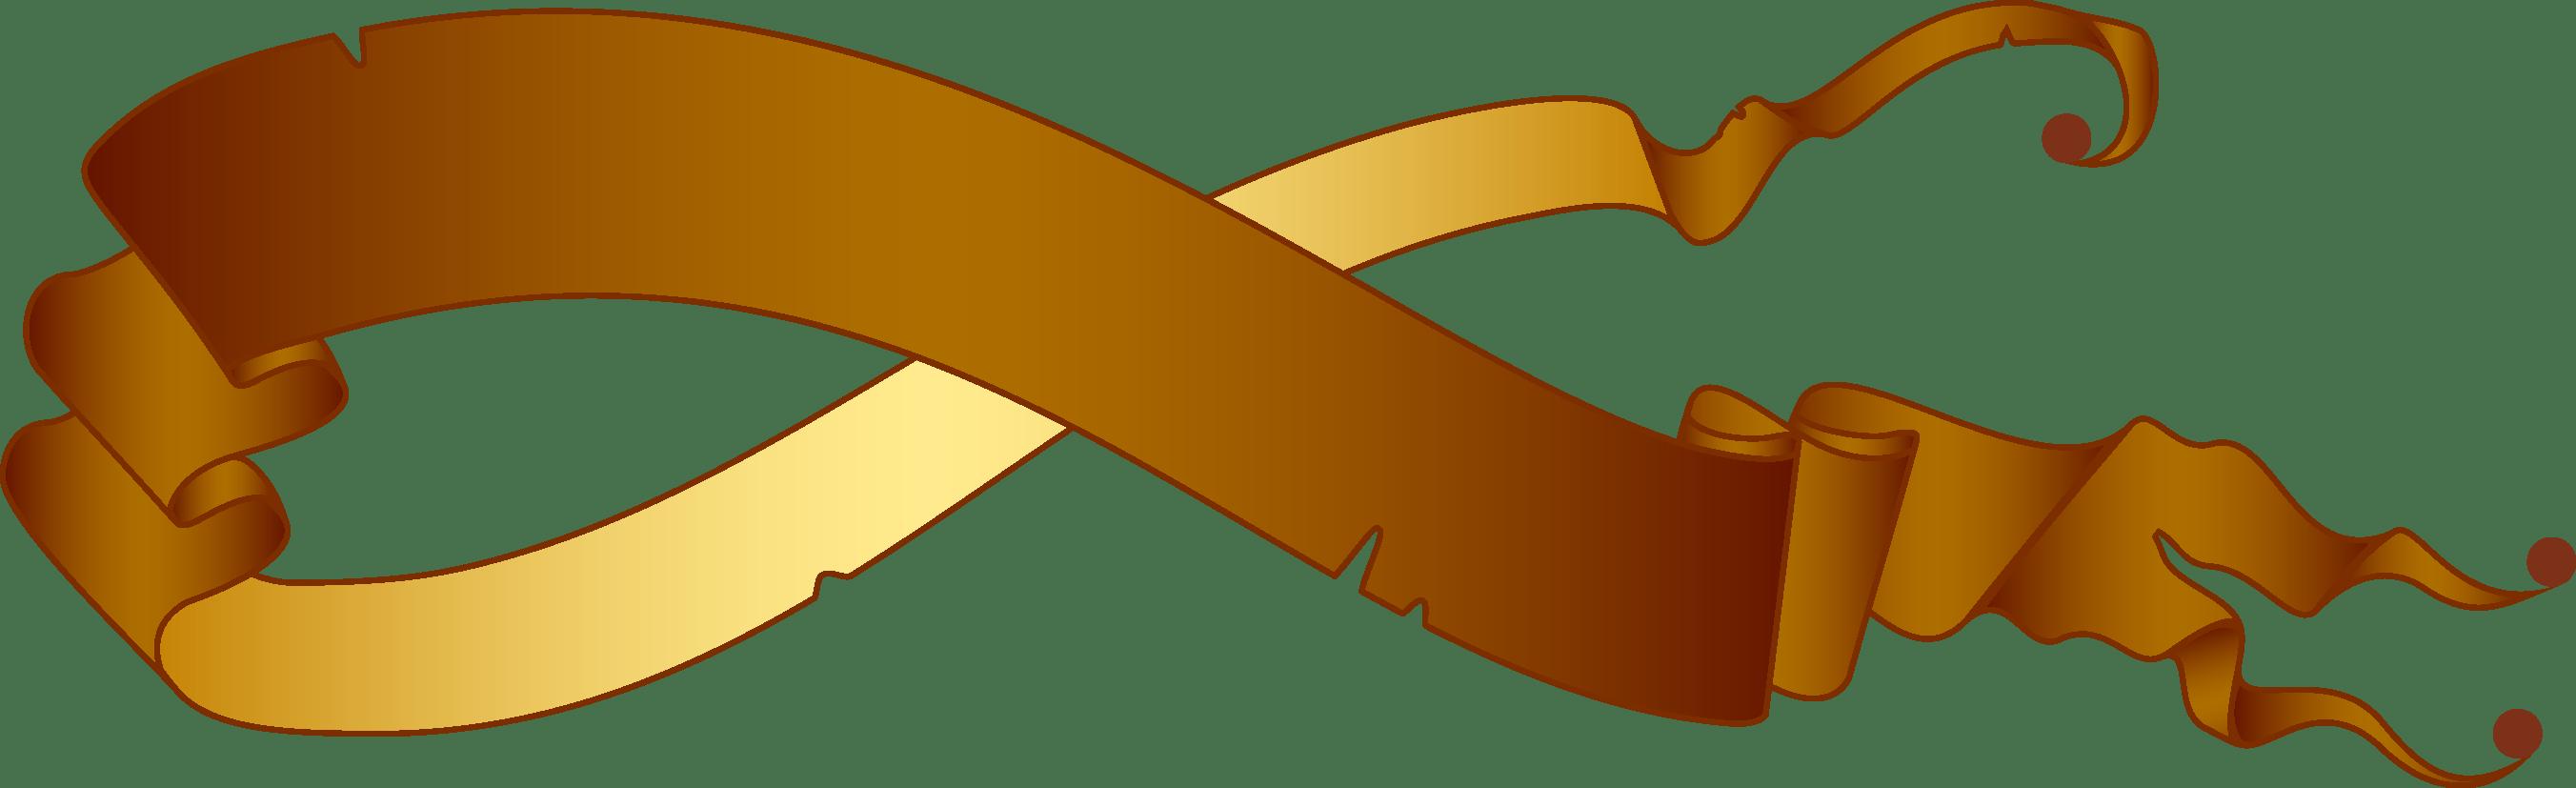 Vintage Ribbons png